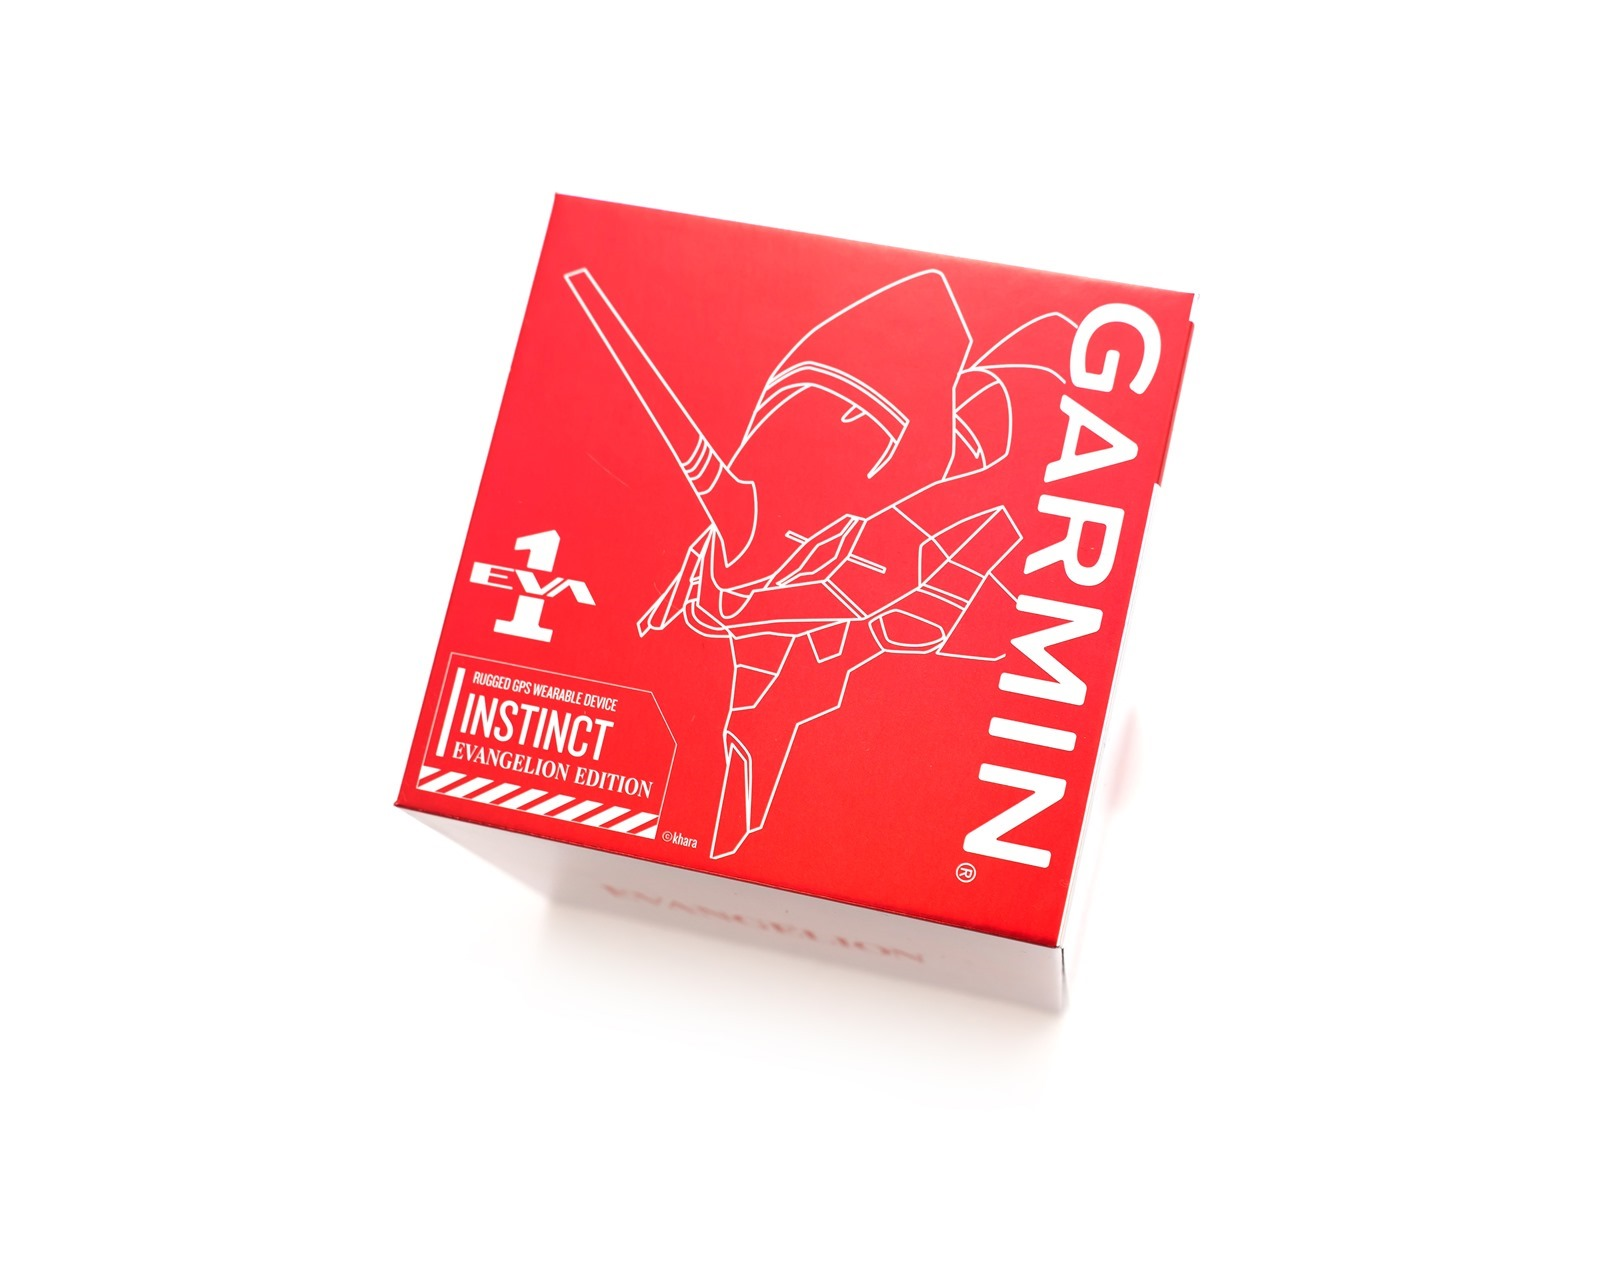 EVA 聯名真香!Garmin Instinct 本我系列 EVA 新世紀福音戰士 限定版 開箱 (初號機版本) @3C 達人廖阿輝